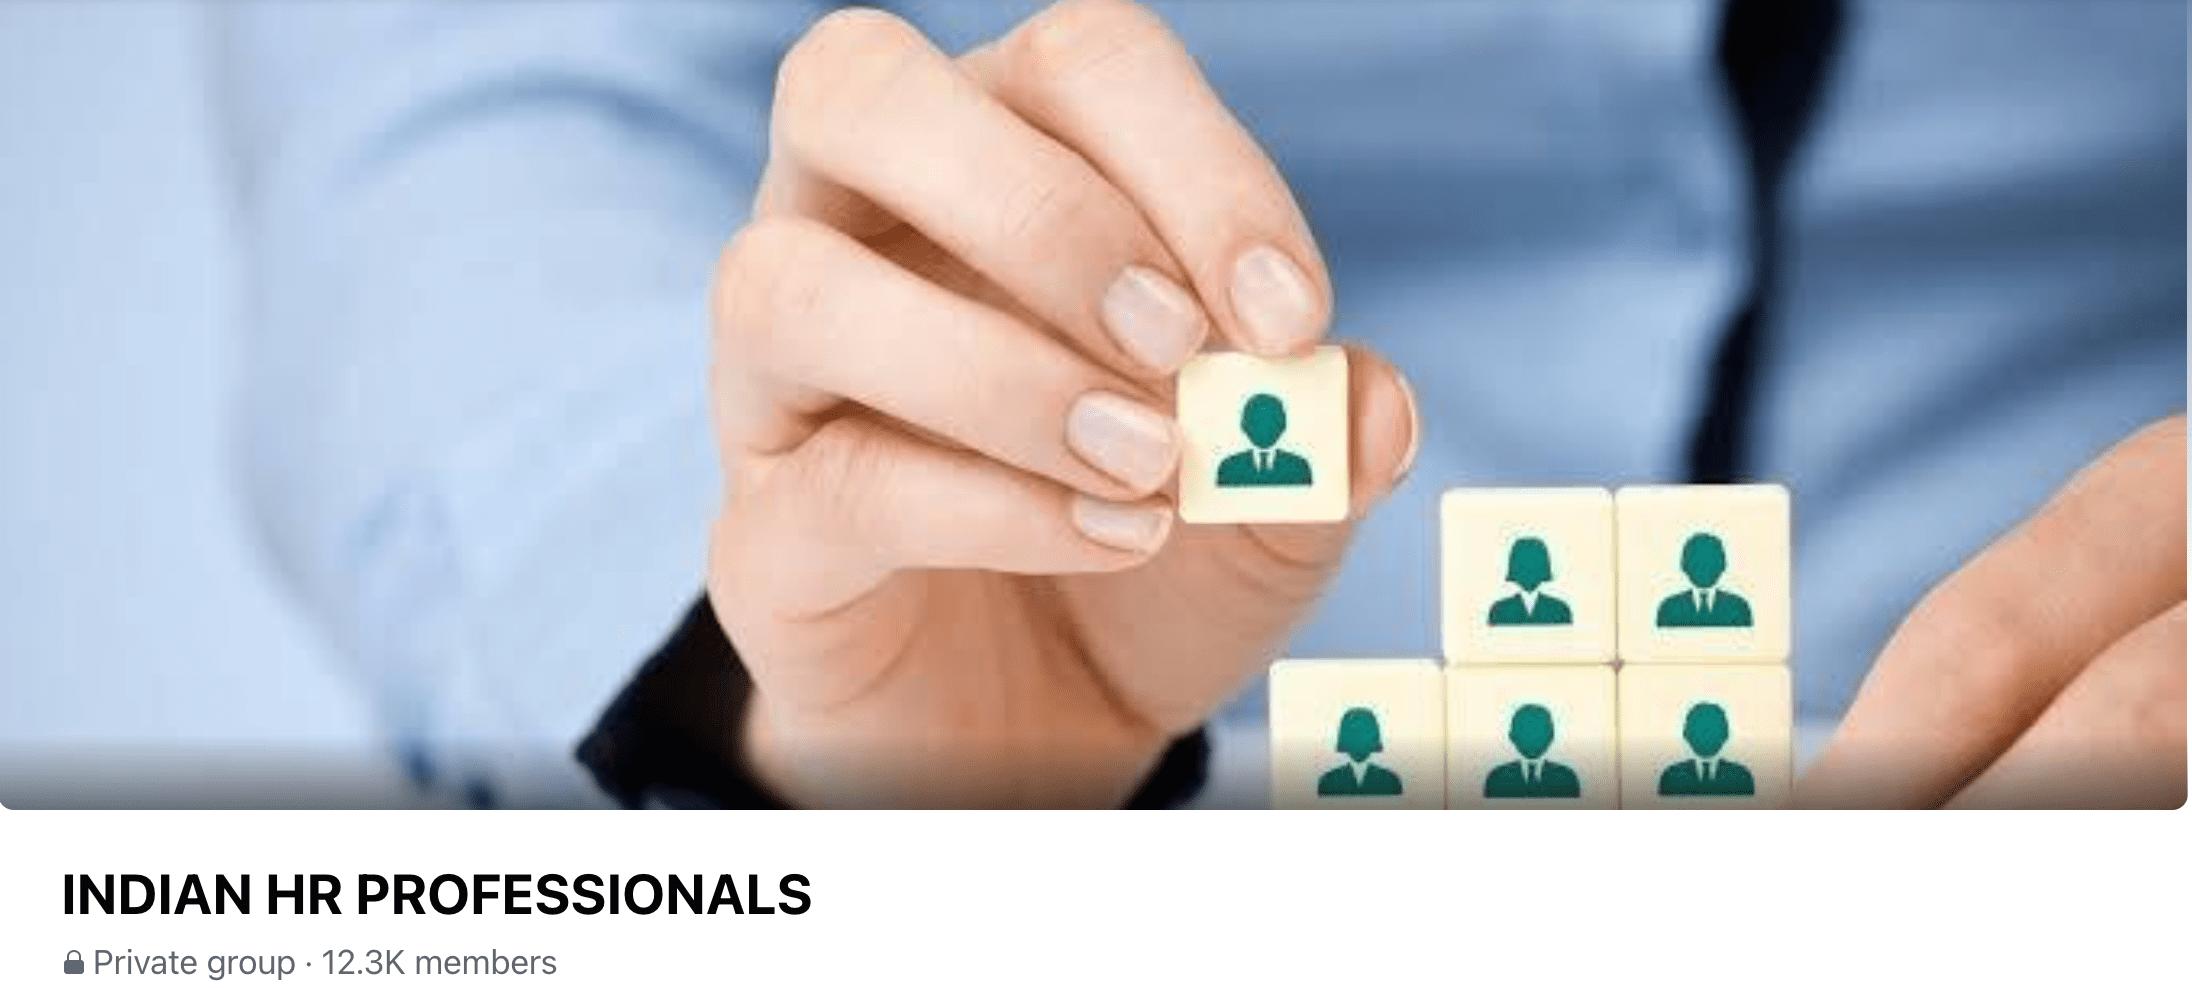 Grove HR - HR Facebook group - Indian HR Professionals-min